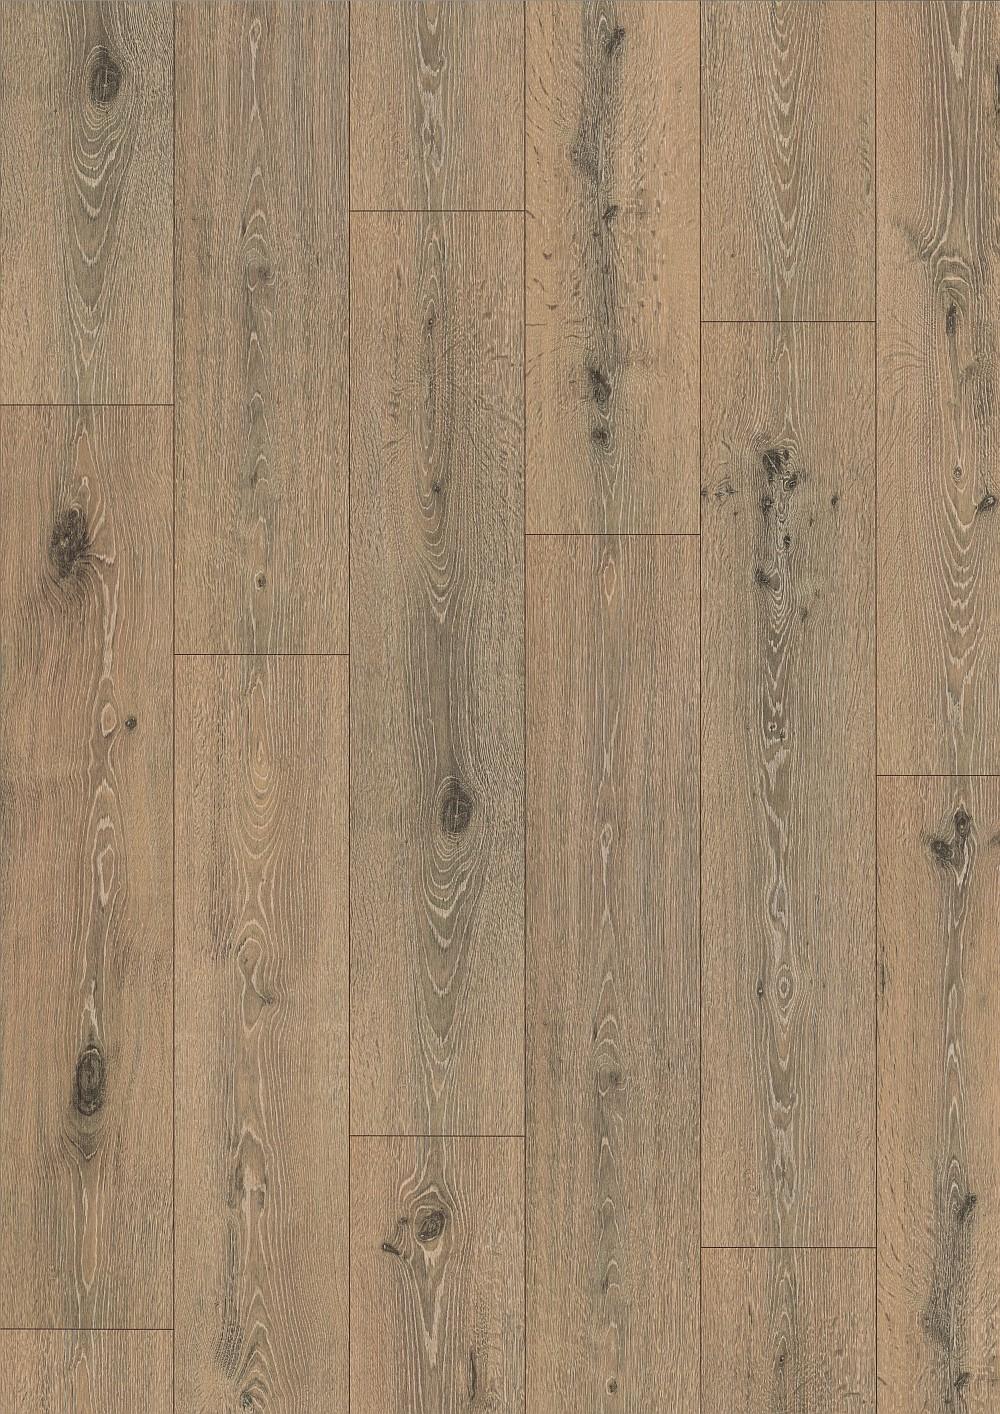 Korková plovoucí podlaha EGGER Cork+ Large (Dub Zeus EGGER CO LA 2018)